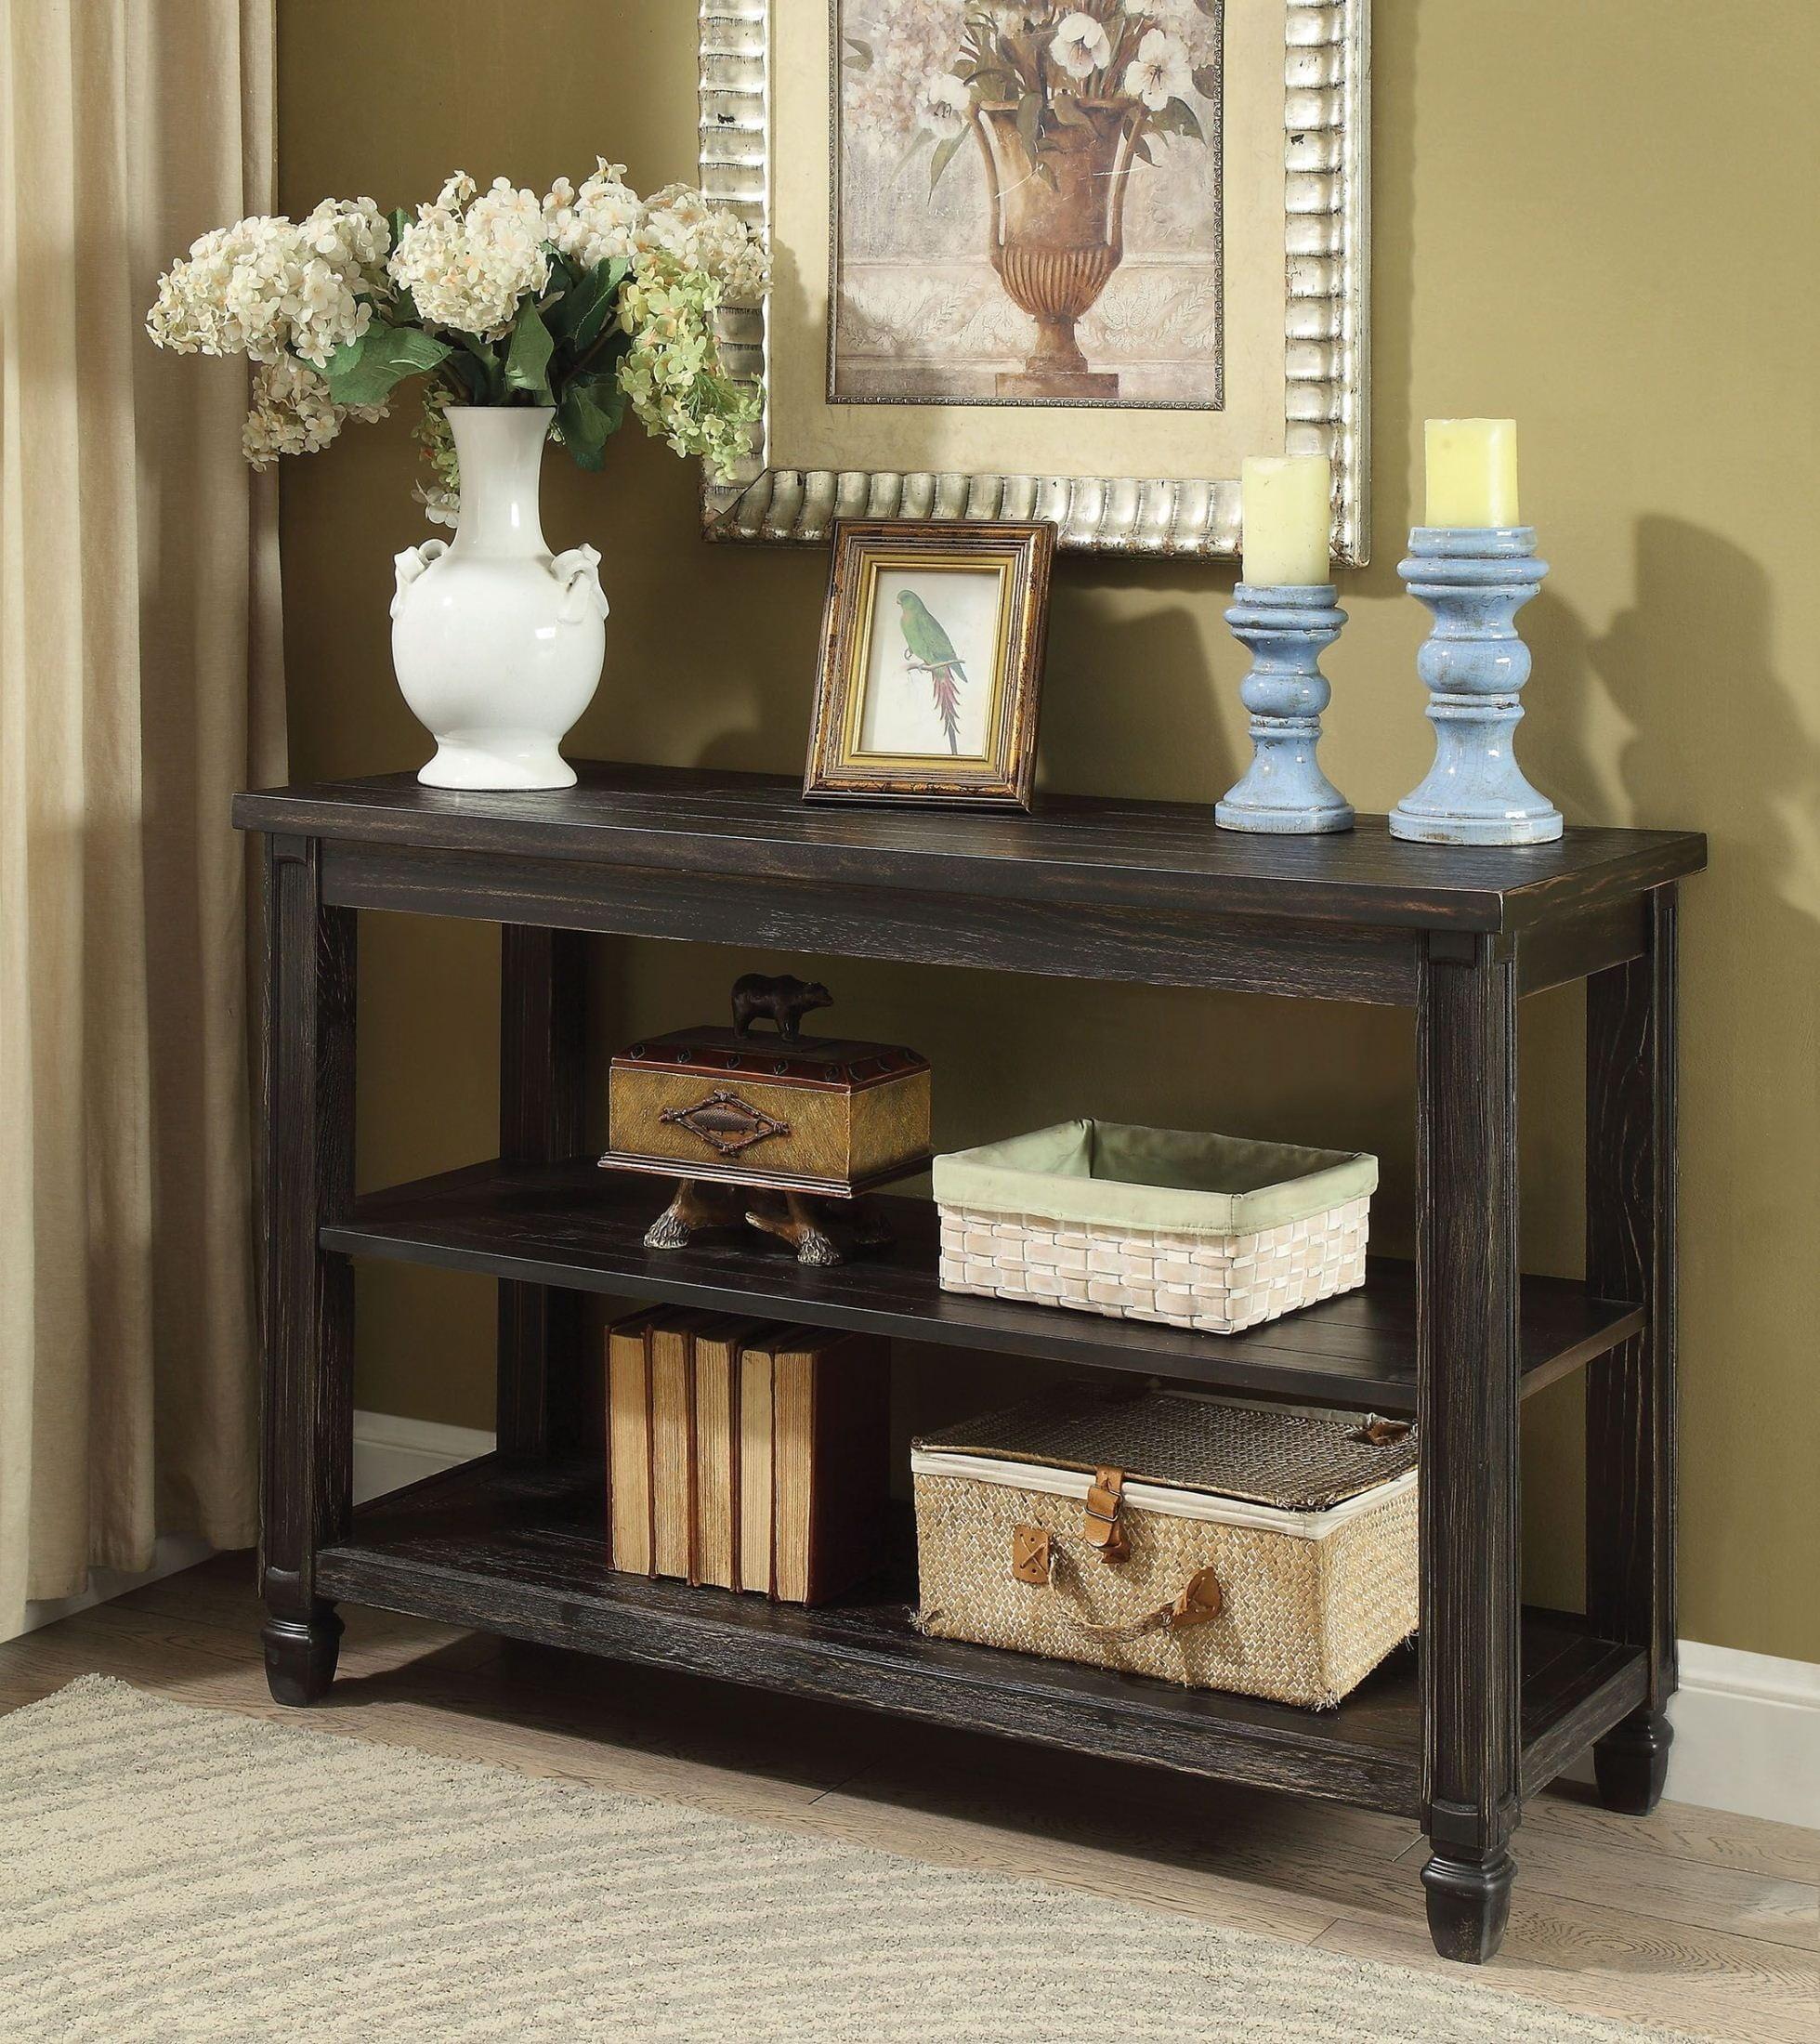 Suzette Antique Black Sofa Table From Furniture Of America  # Muebles Luan Arbo